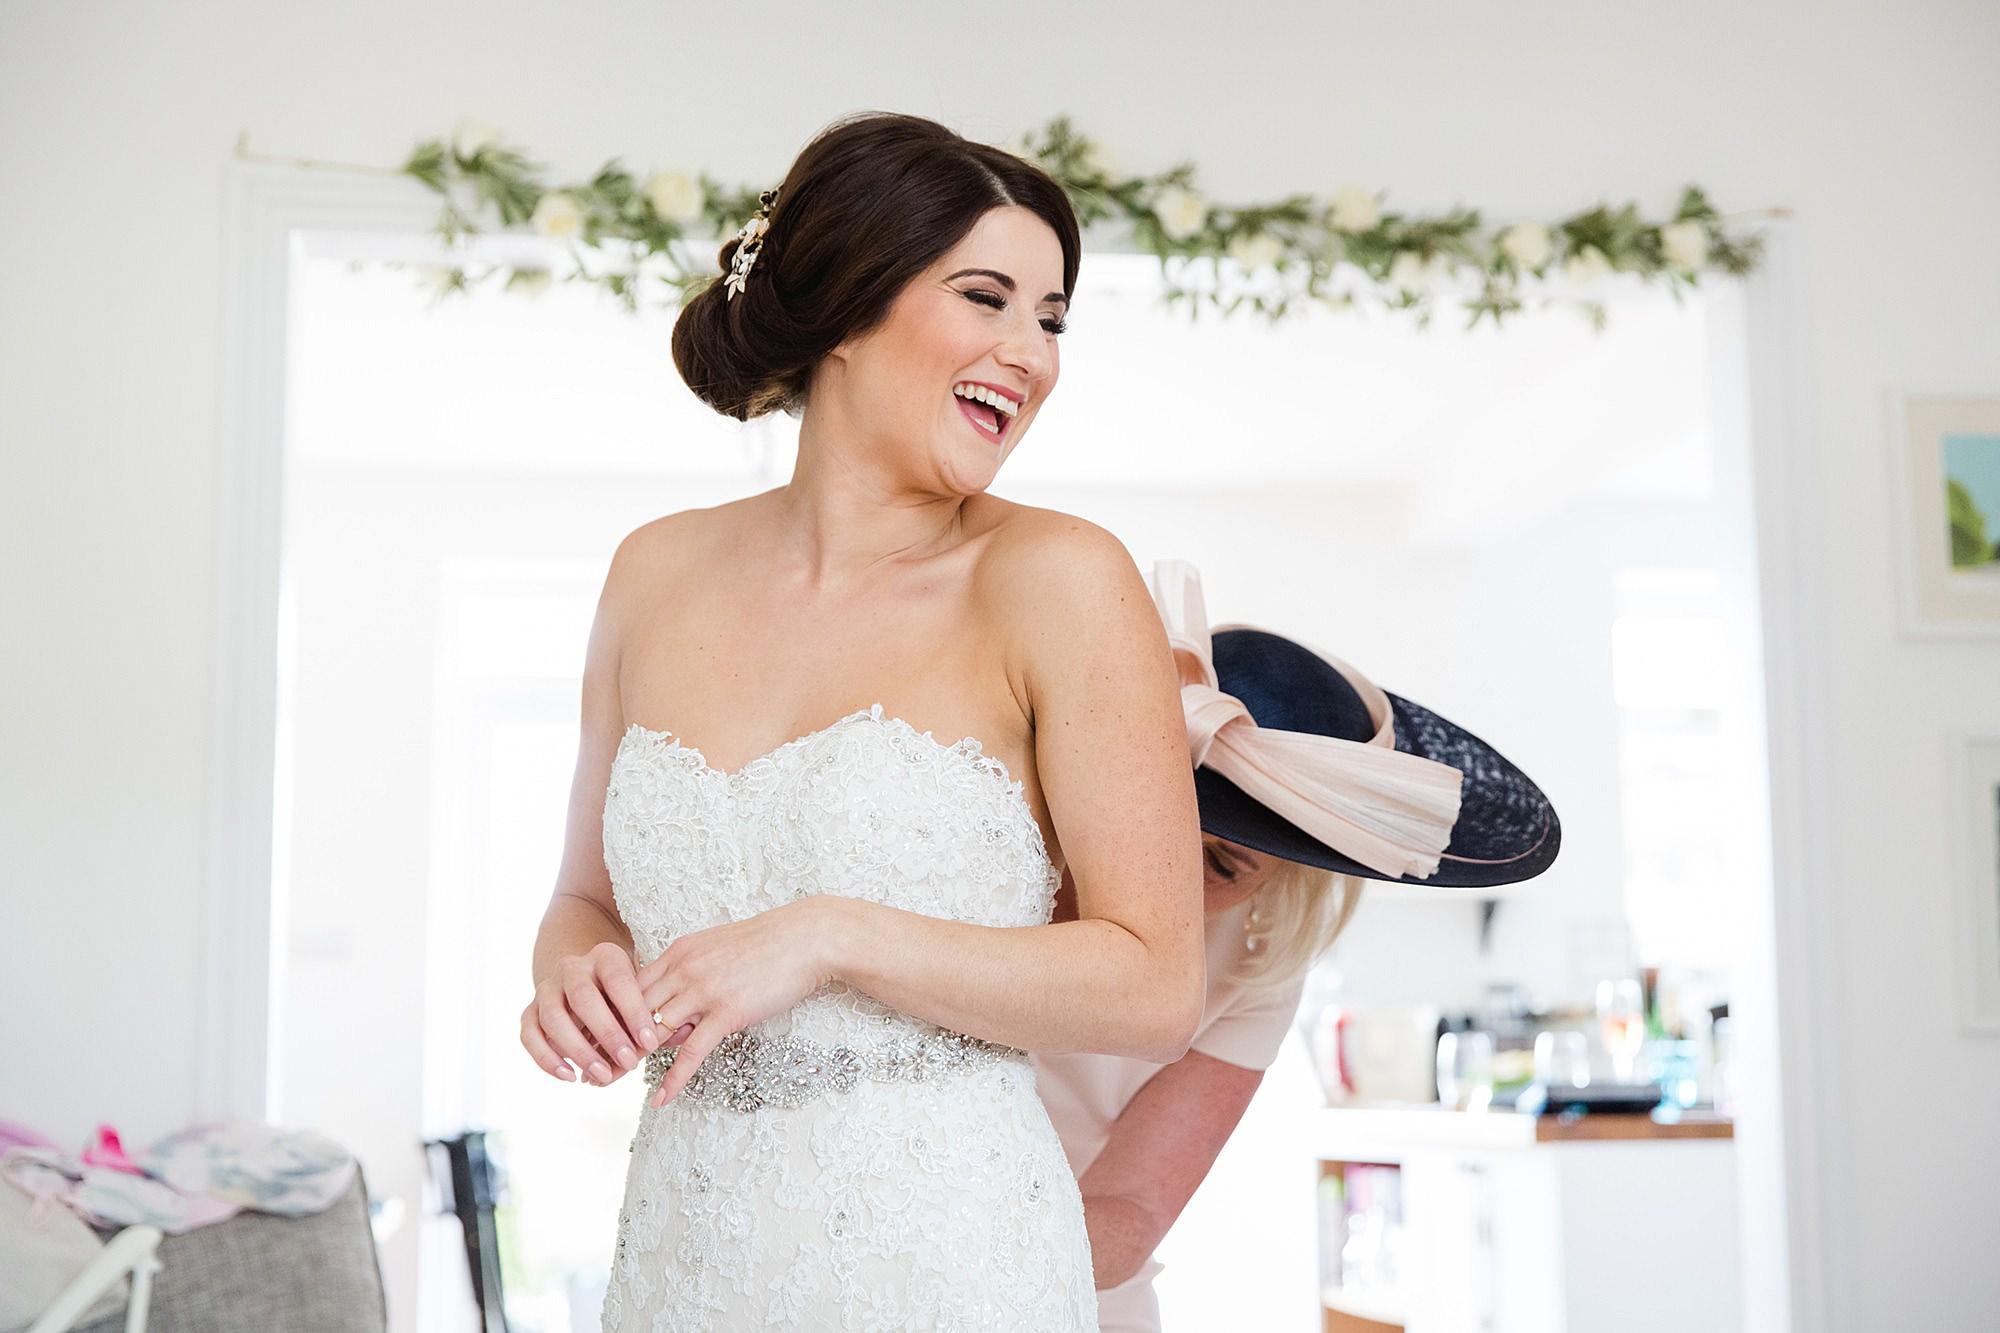 Lillibrooke Manor wedding bride laughs as mother adjusts her dress